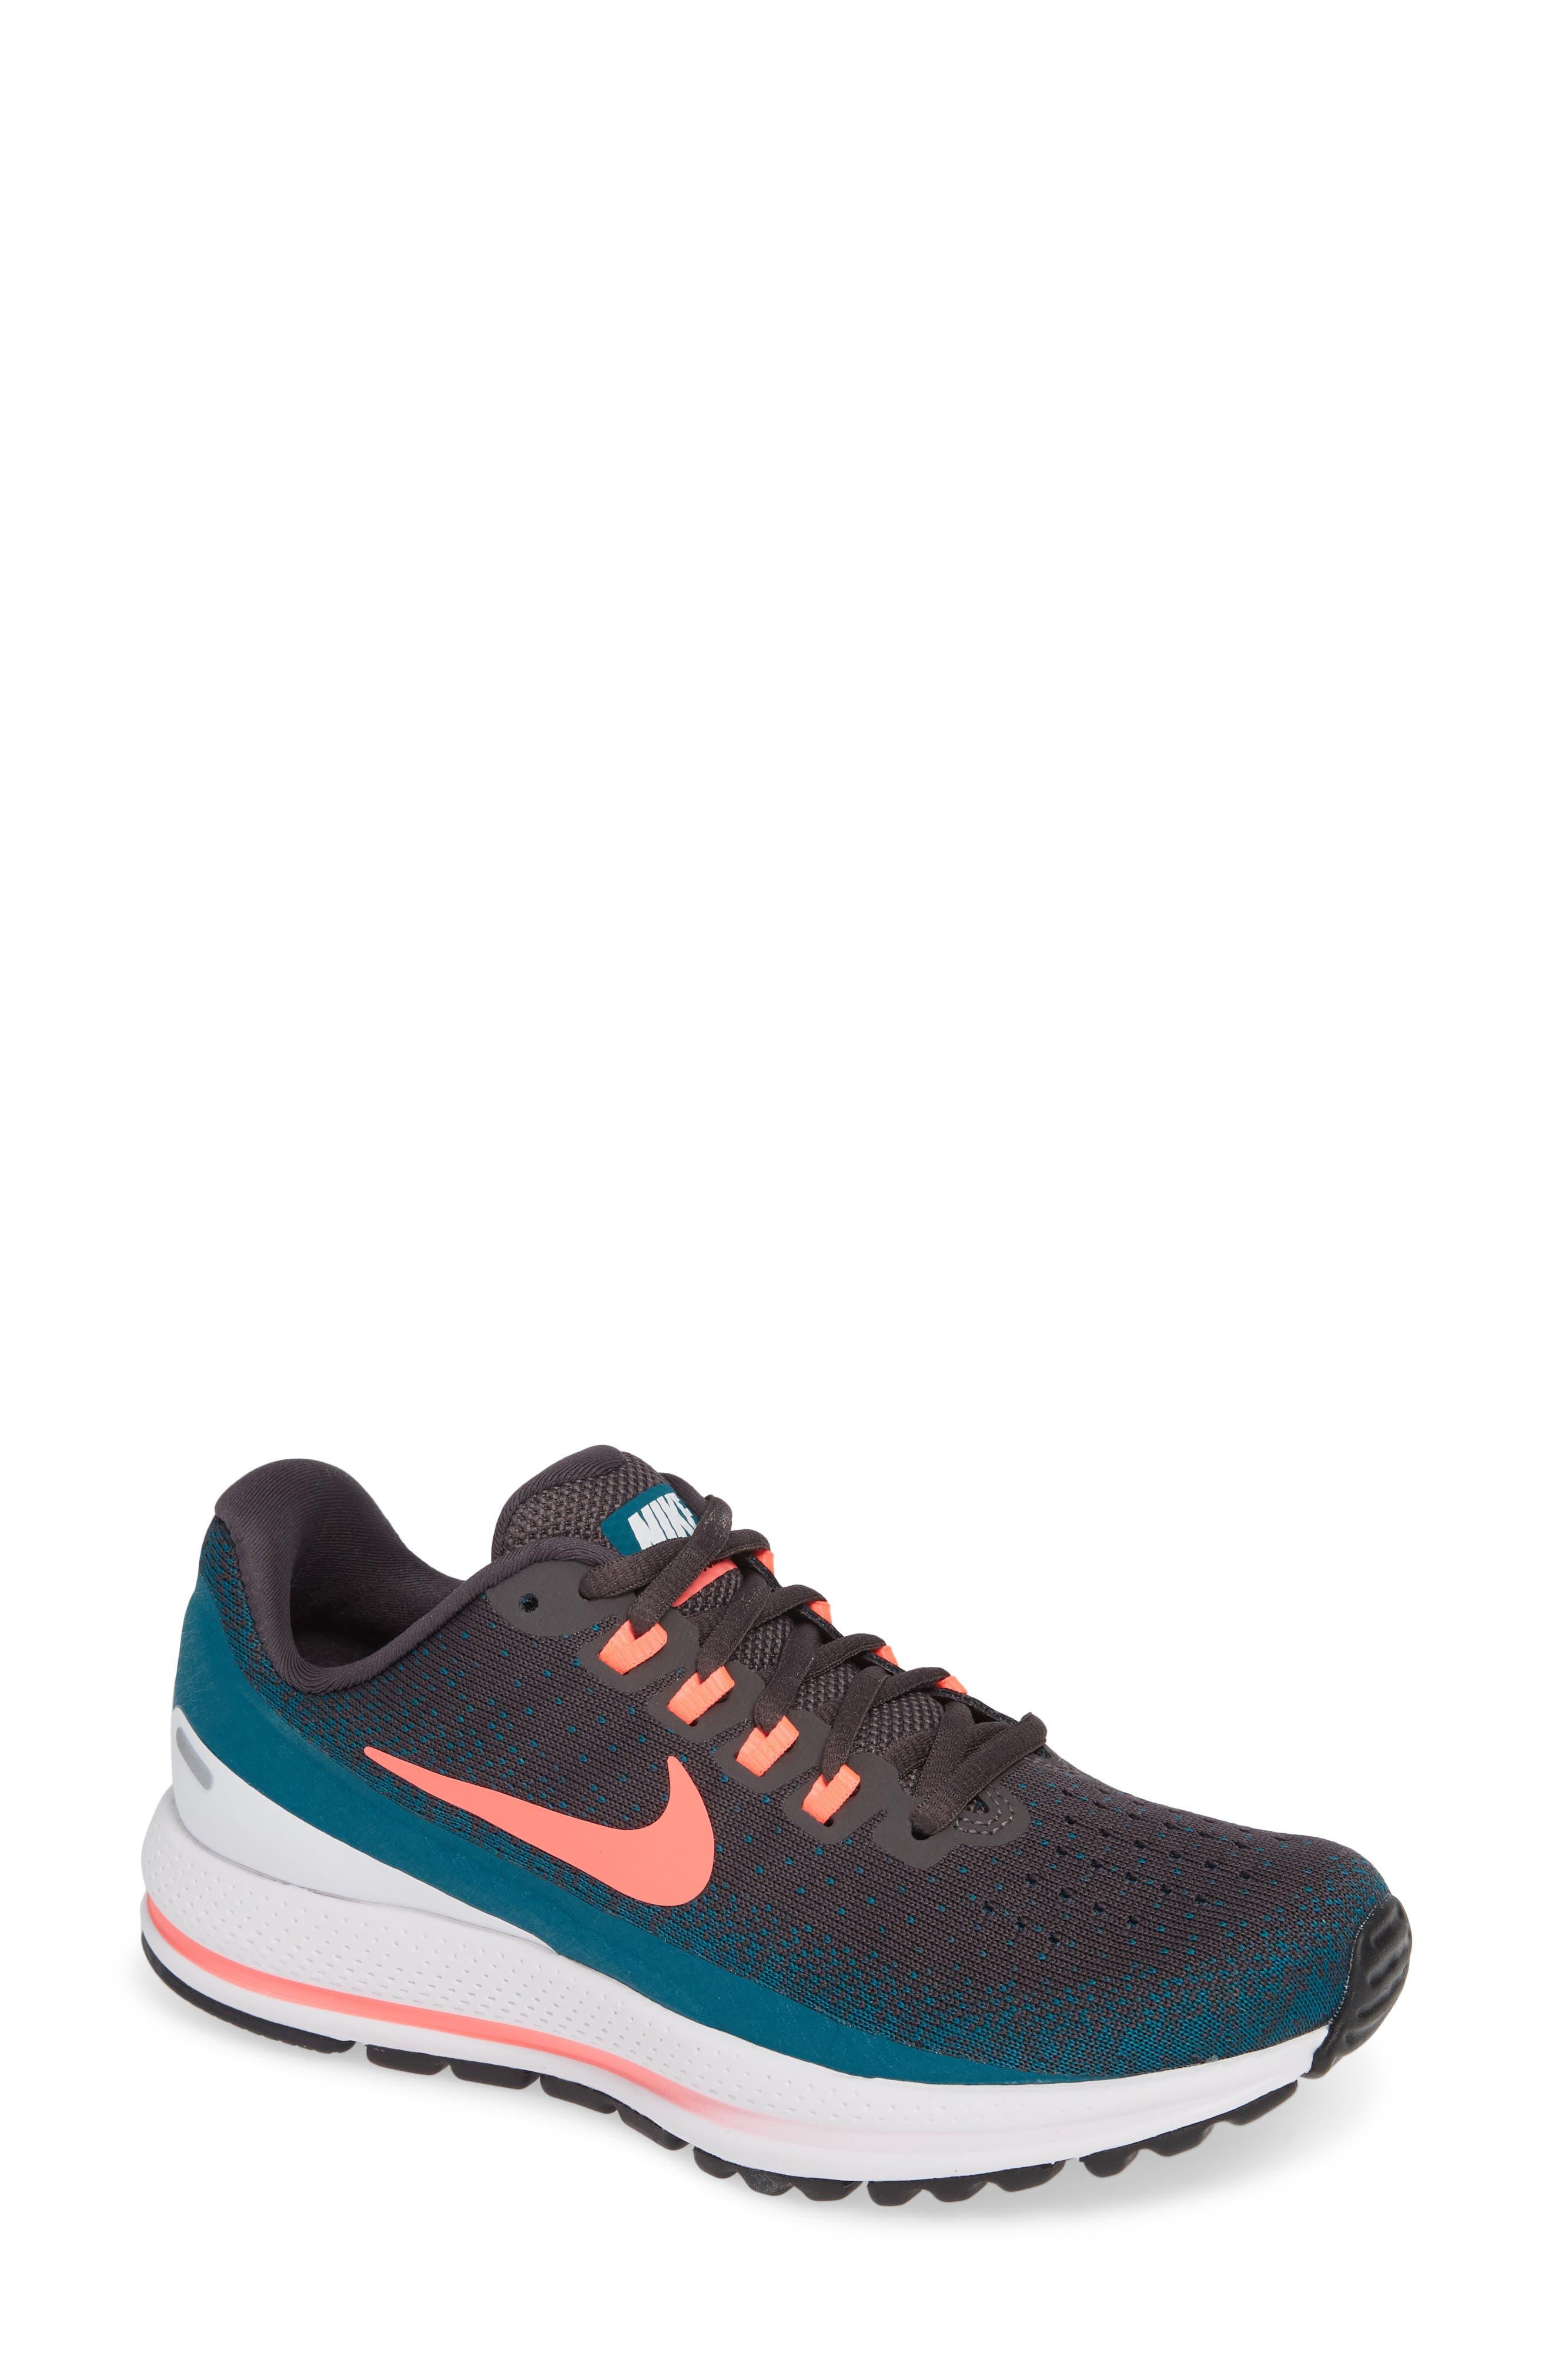 Air Zoom Vomero 13 Running Shoe,                             Main thumbnail 1, color,